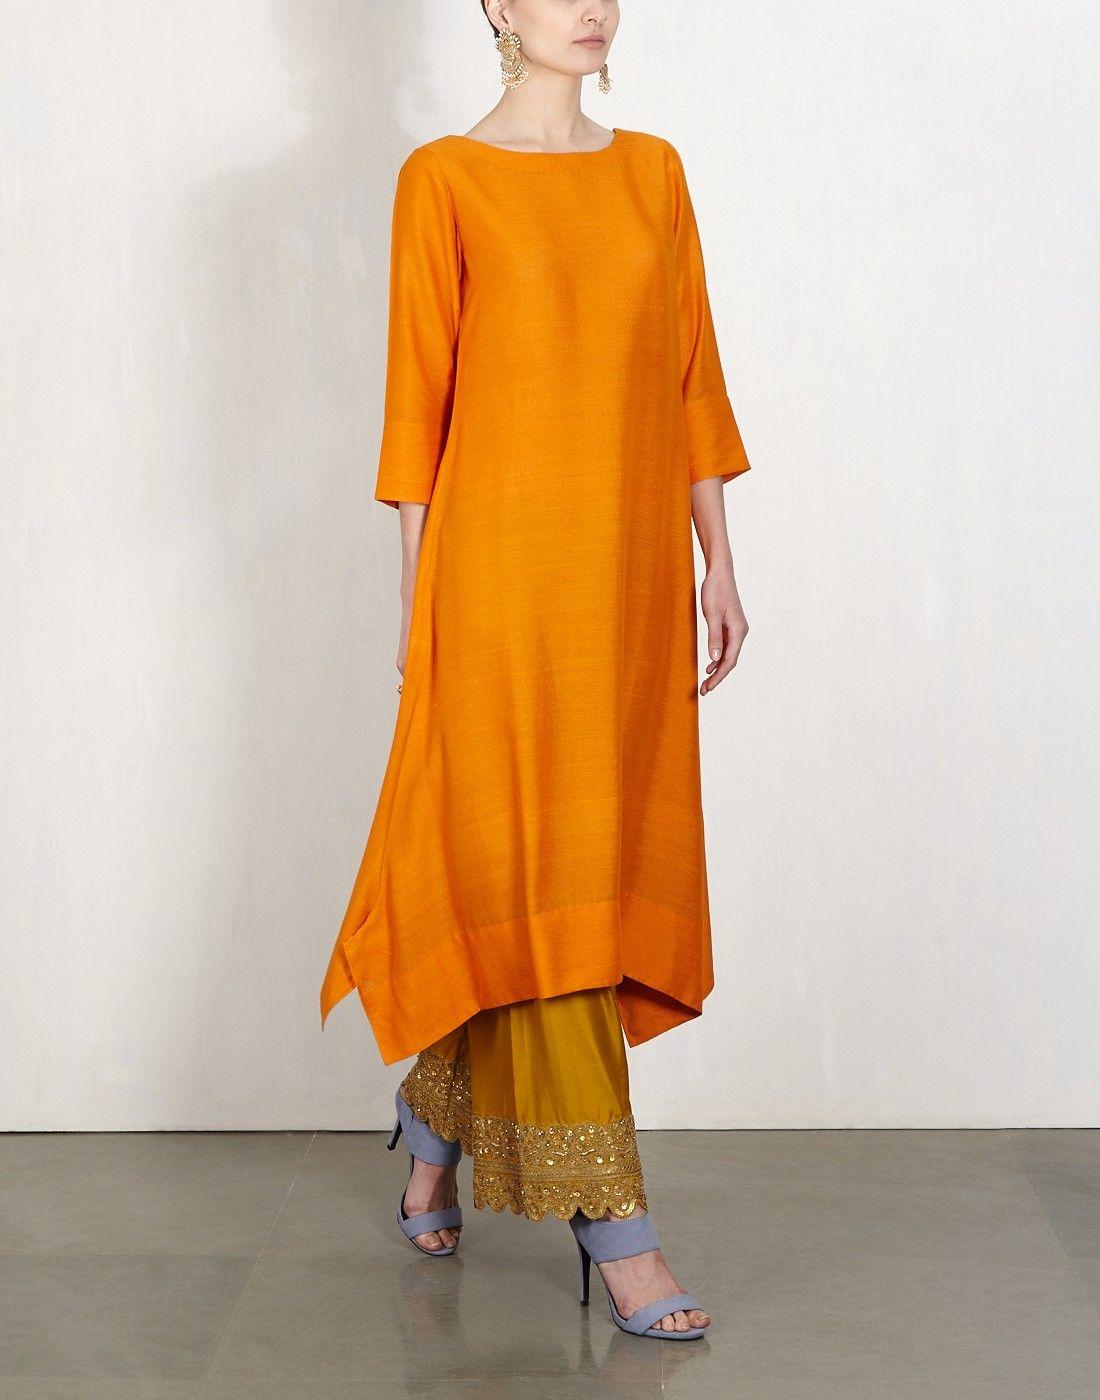 Orange Kurta With  Embroidered Pants-Lajjoo C